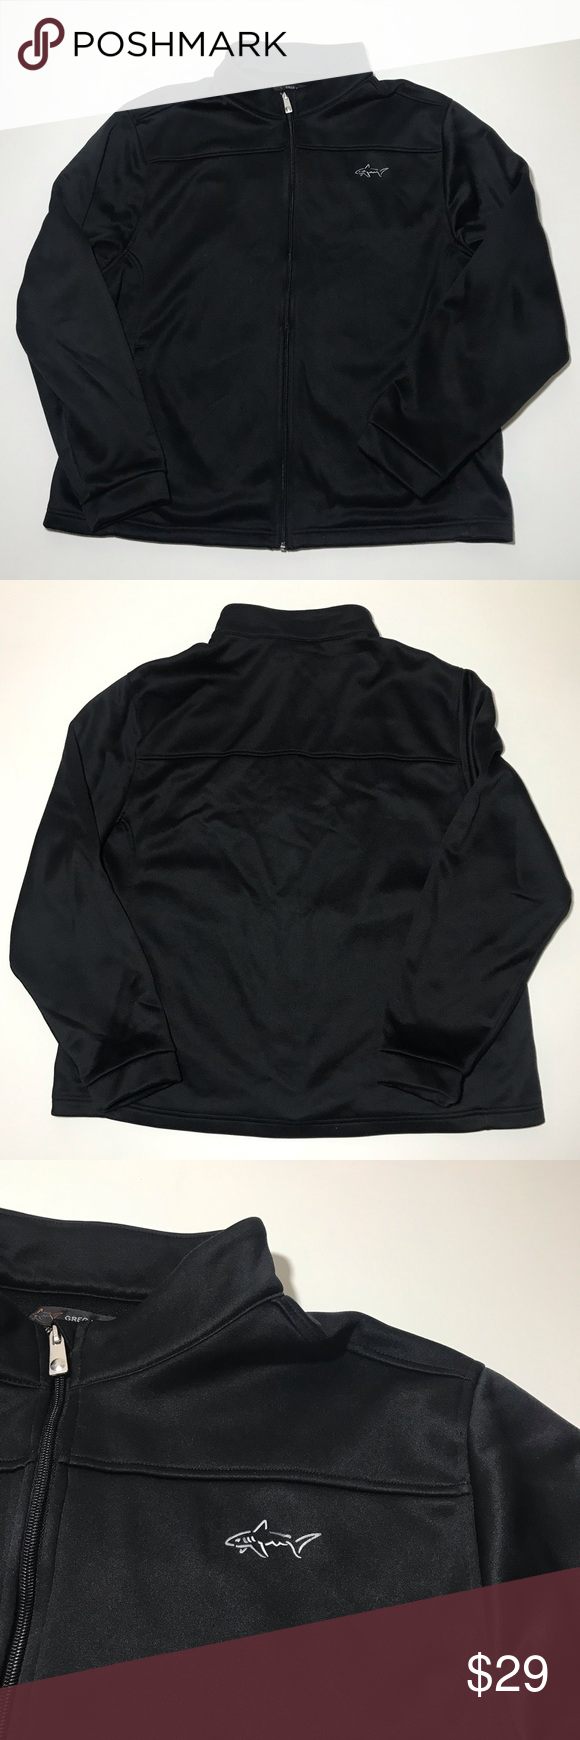 Greg Norman Black Full Zip Sweater Jacket Size Xl In 2020 Sweater Jacket Zip Sweater Jackets